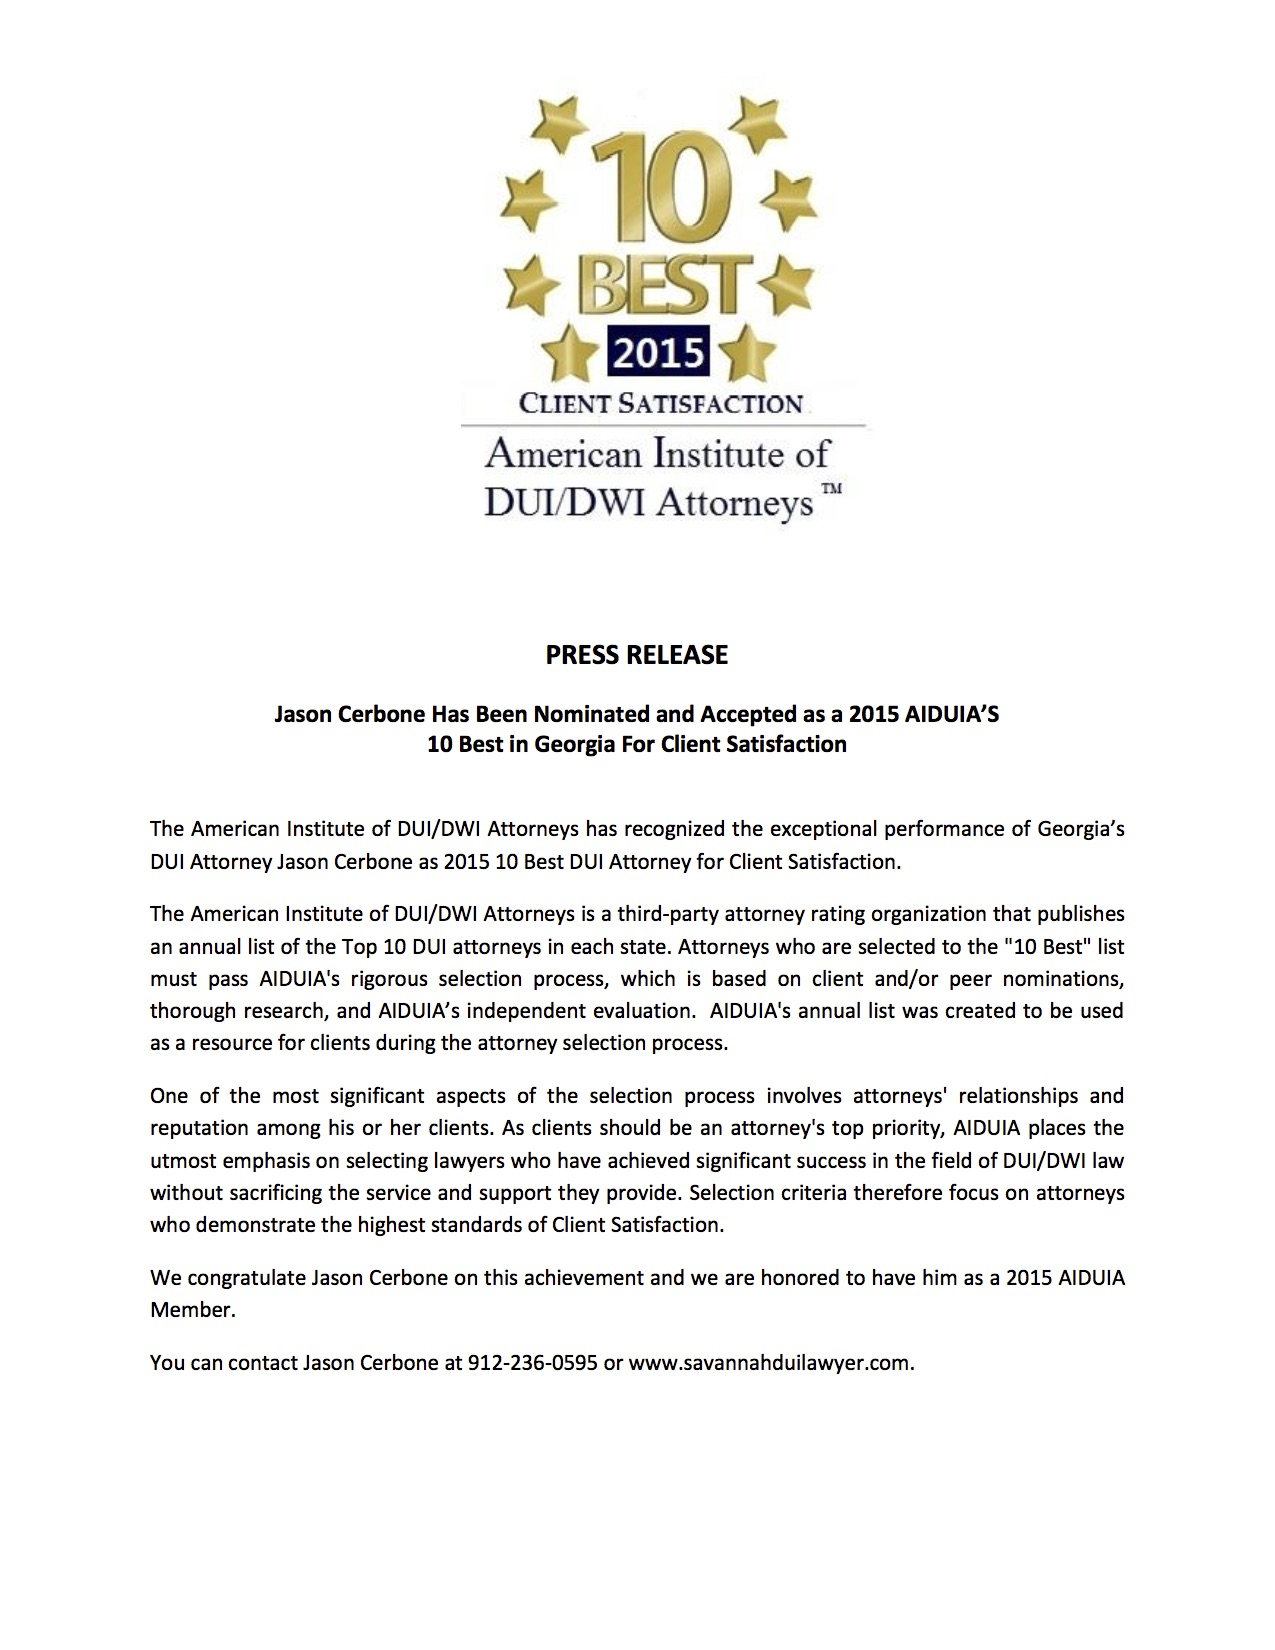 American Institute DUI Attorneys Press Release Jason Cerbone DUI Lawyer